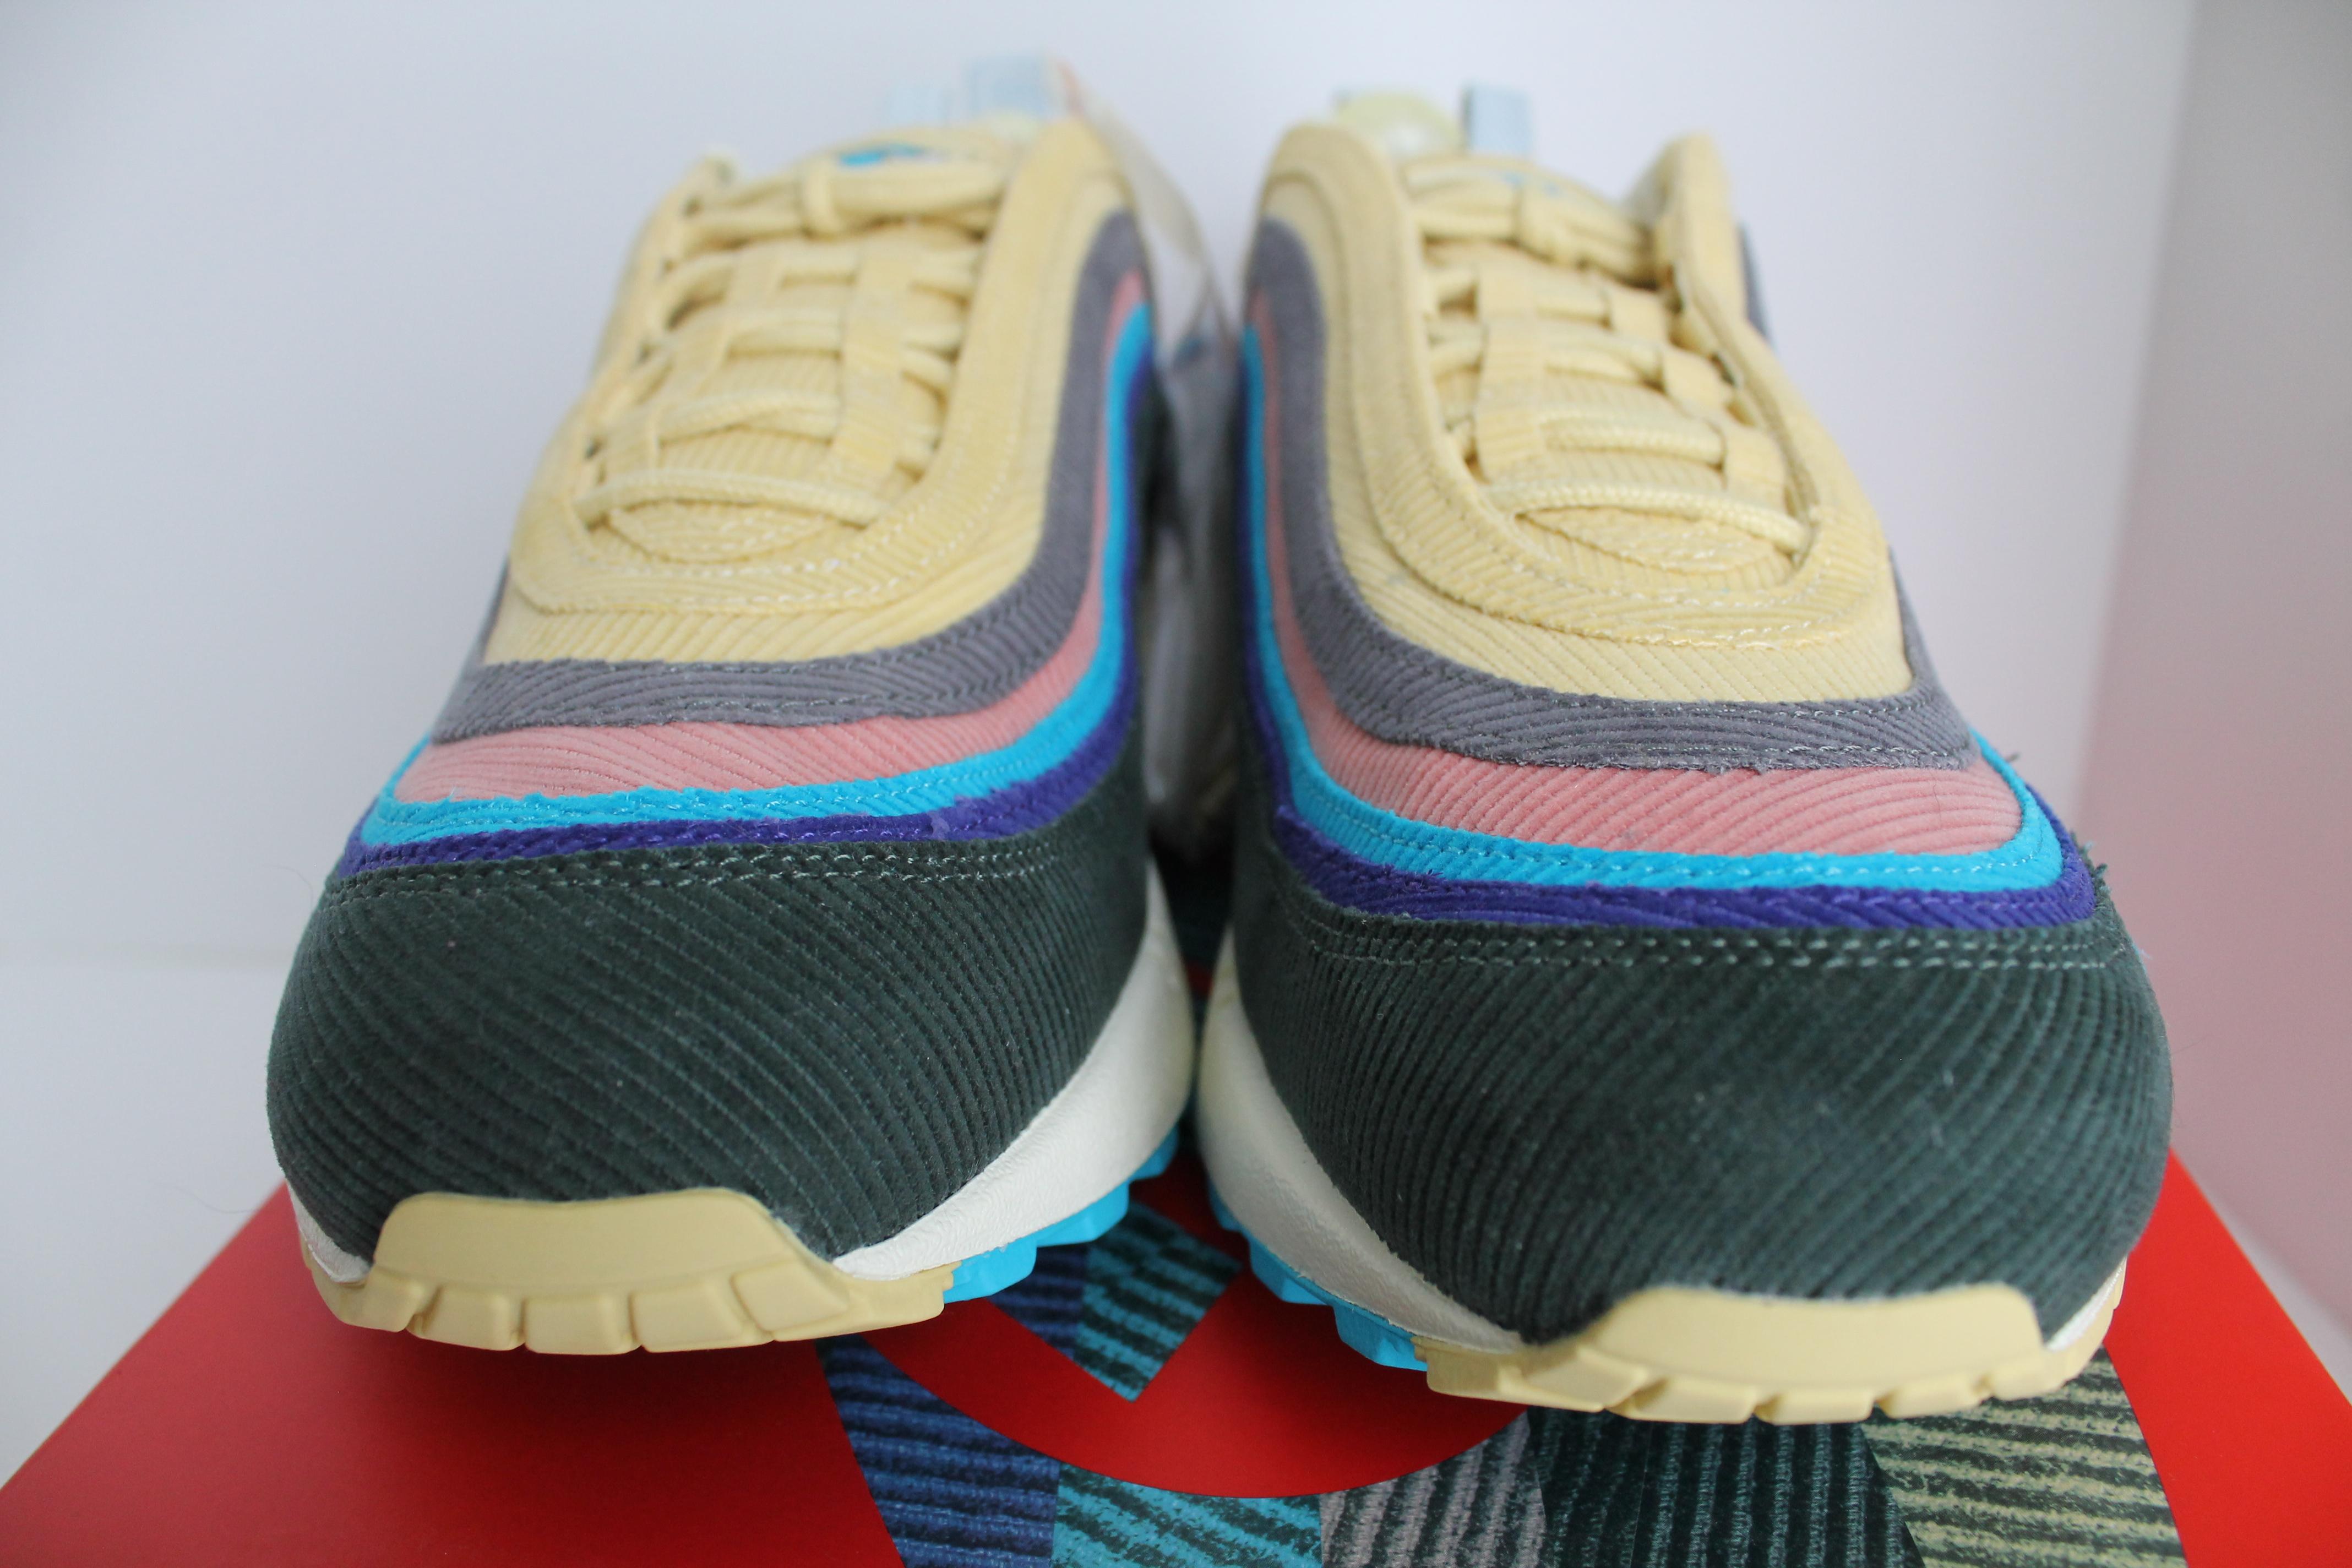 ccfc0b92bb ... Nike Air Max 1/97 VF Sean Wotherspoon ...